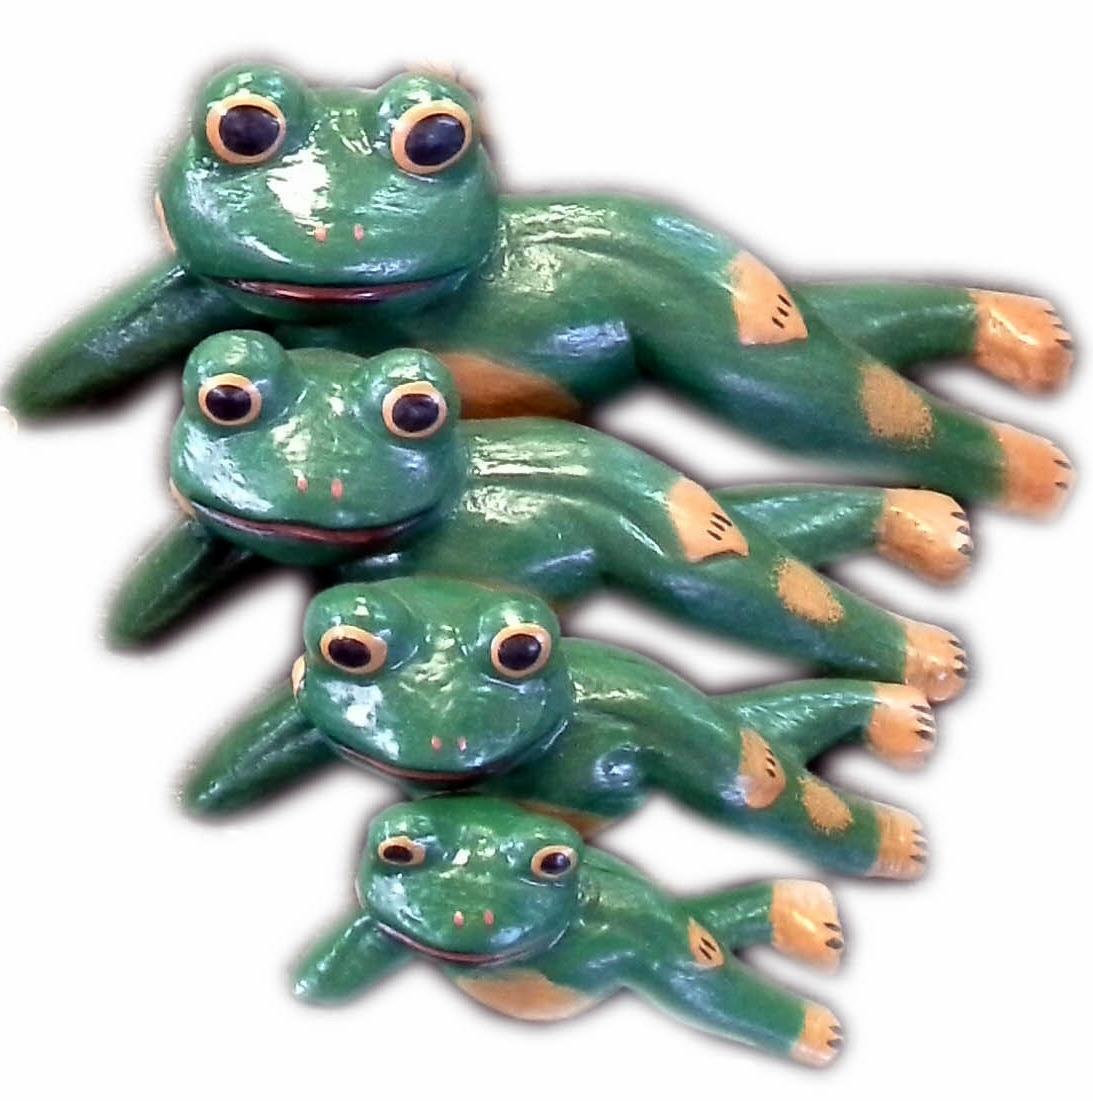 Frogs Recline-4